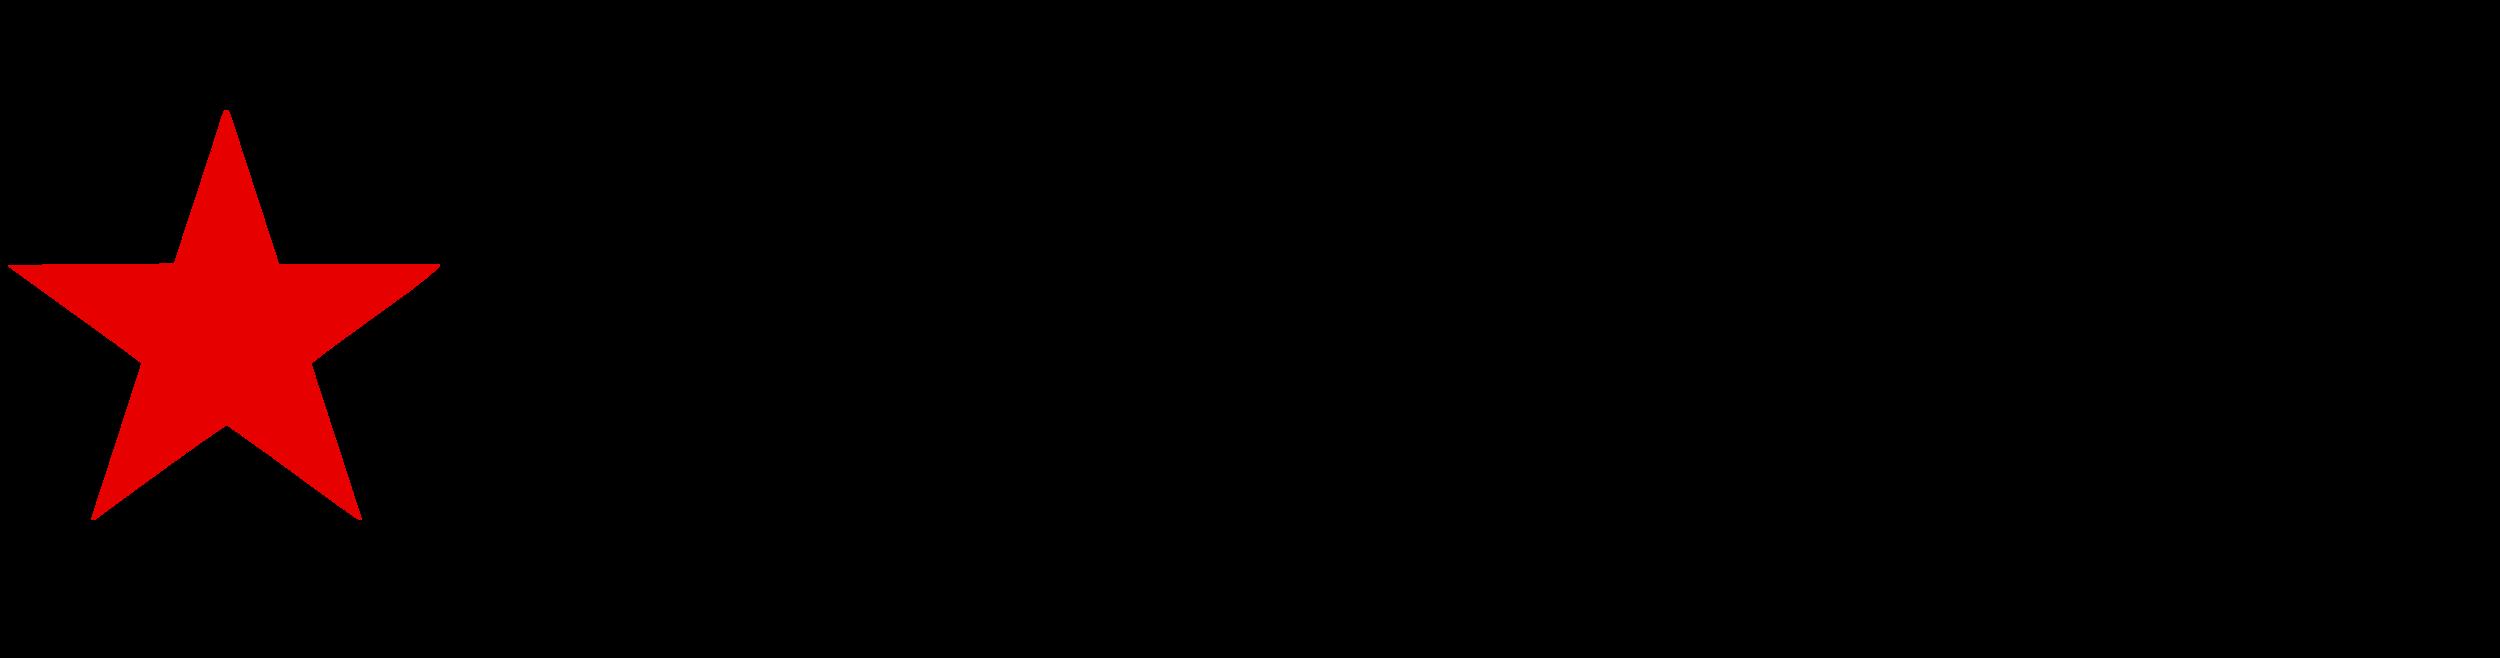 Macys_logo_logotype_emblem.png